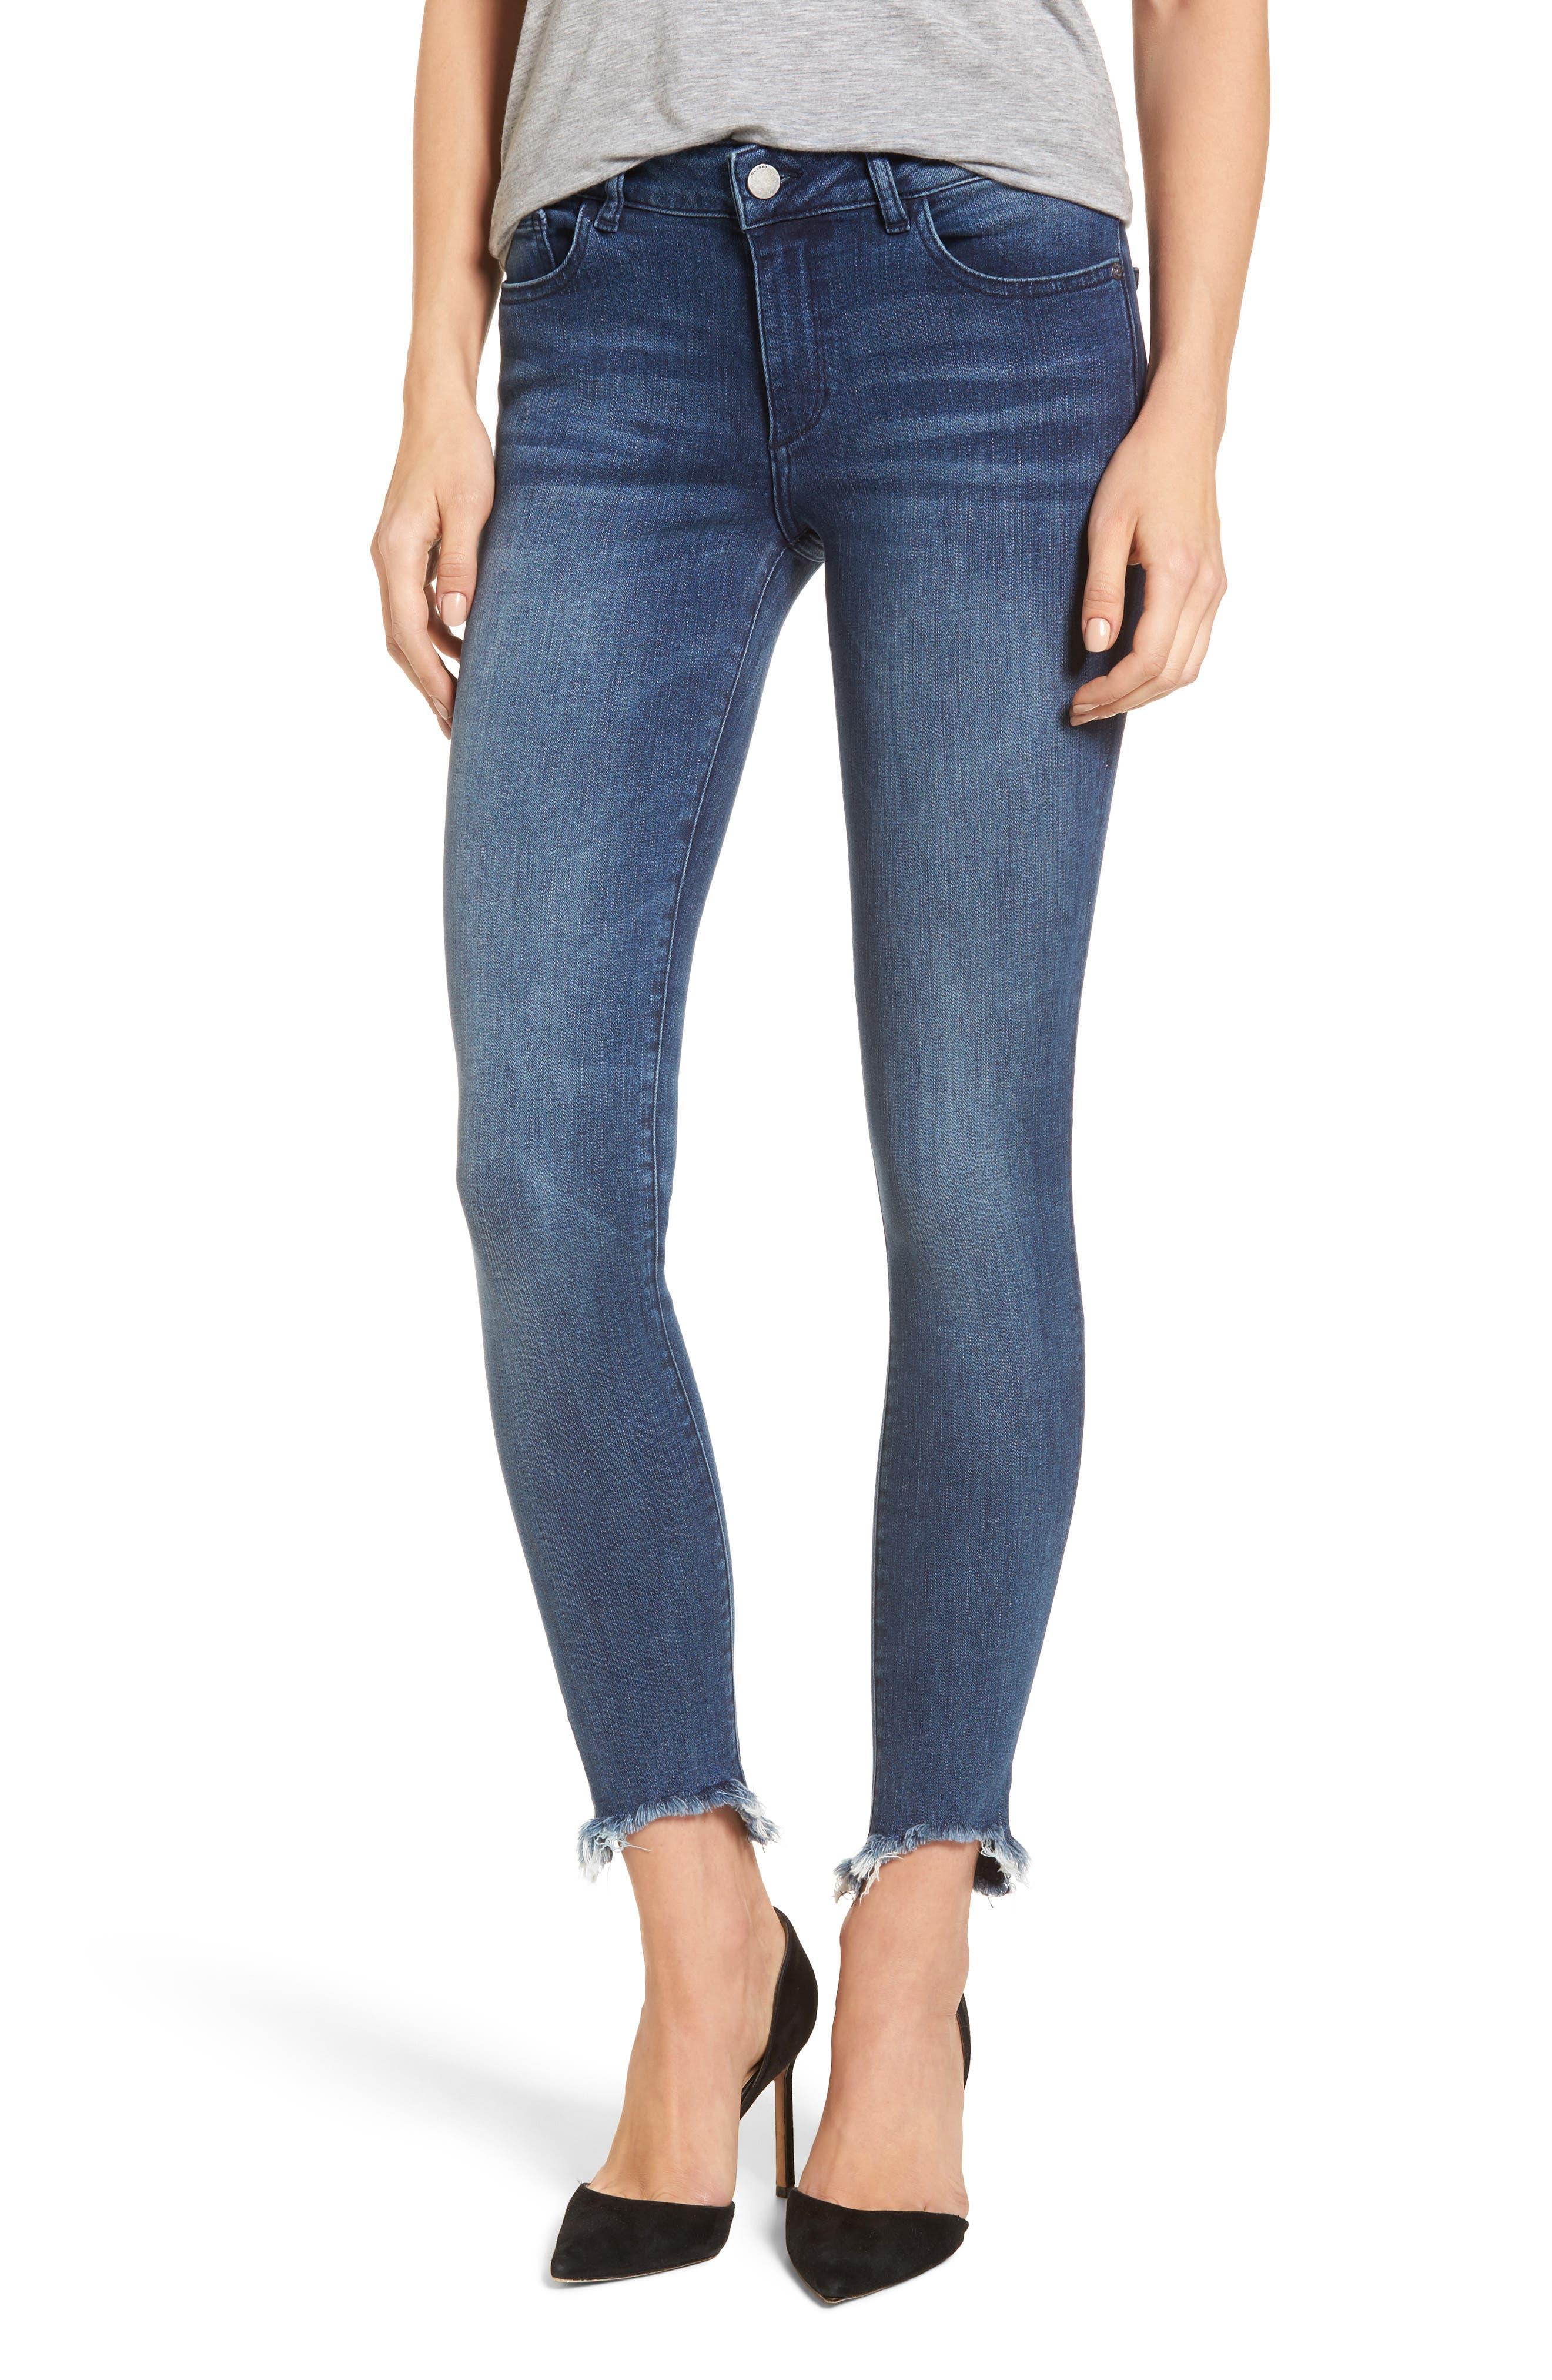 Main Image - DL1961 Emma Power Legging Jeans (Fenwick)